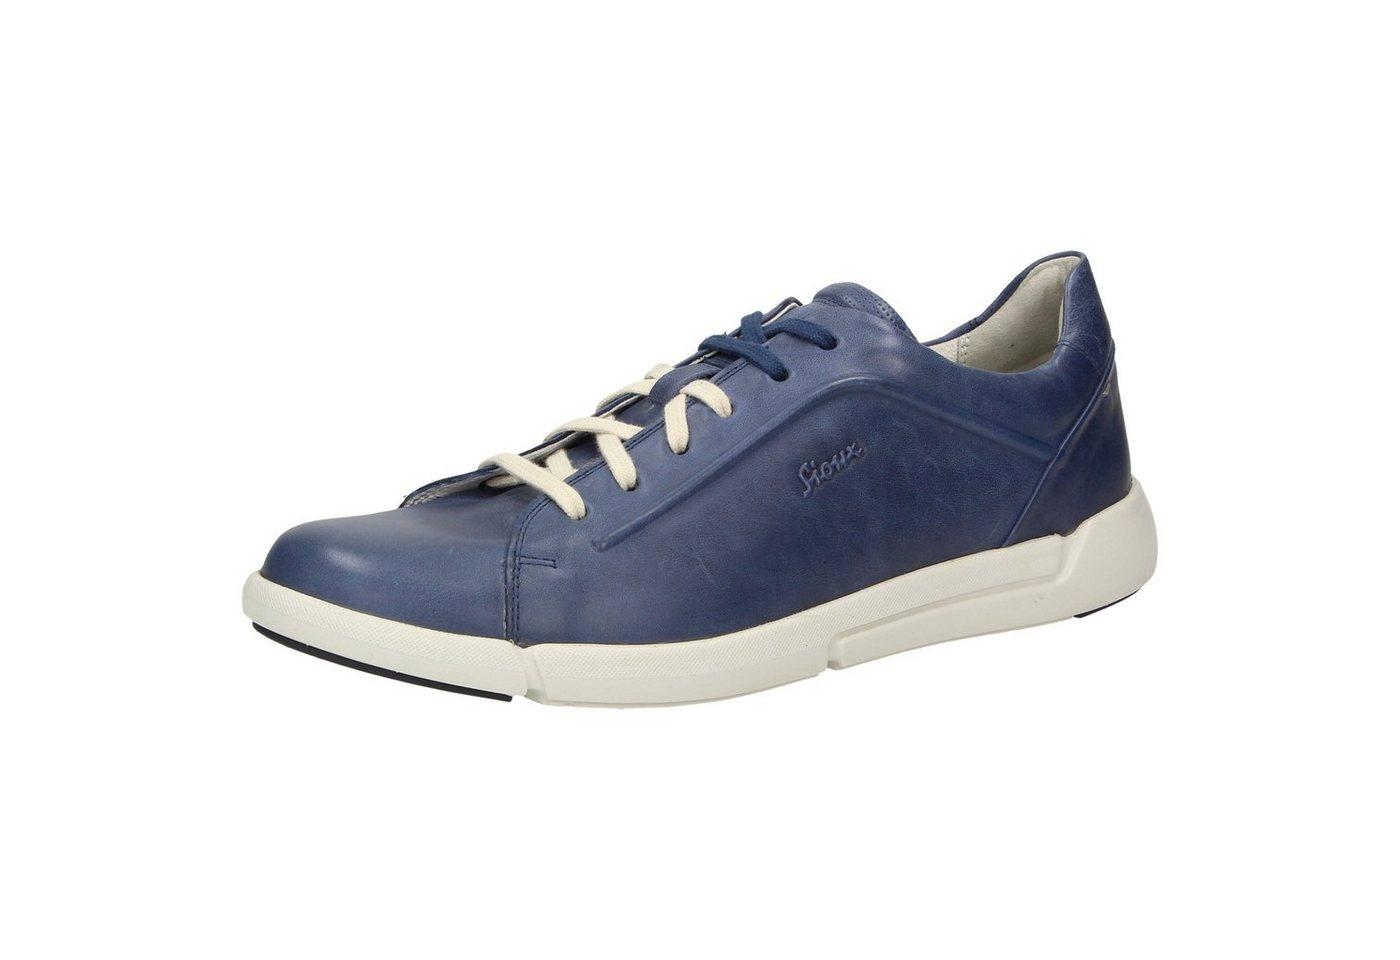 Herren SIOUX Runol Sneaker blau   04054765394689